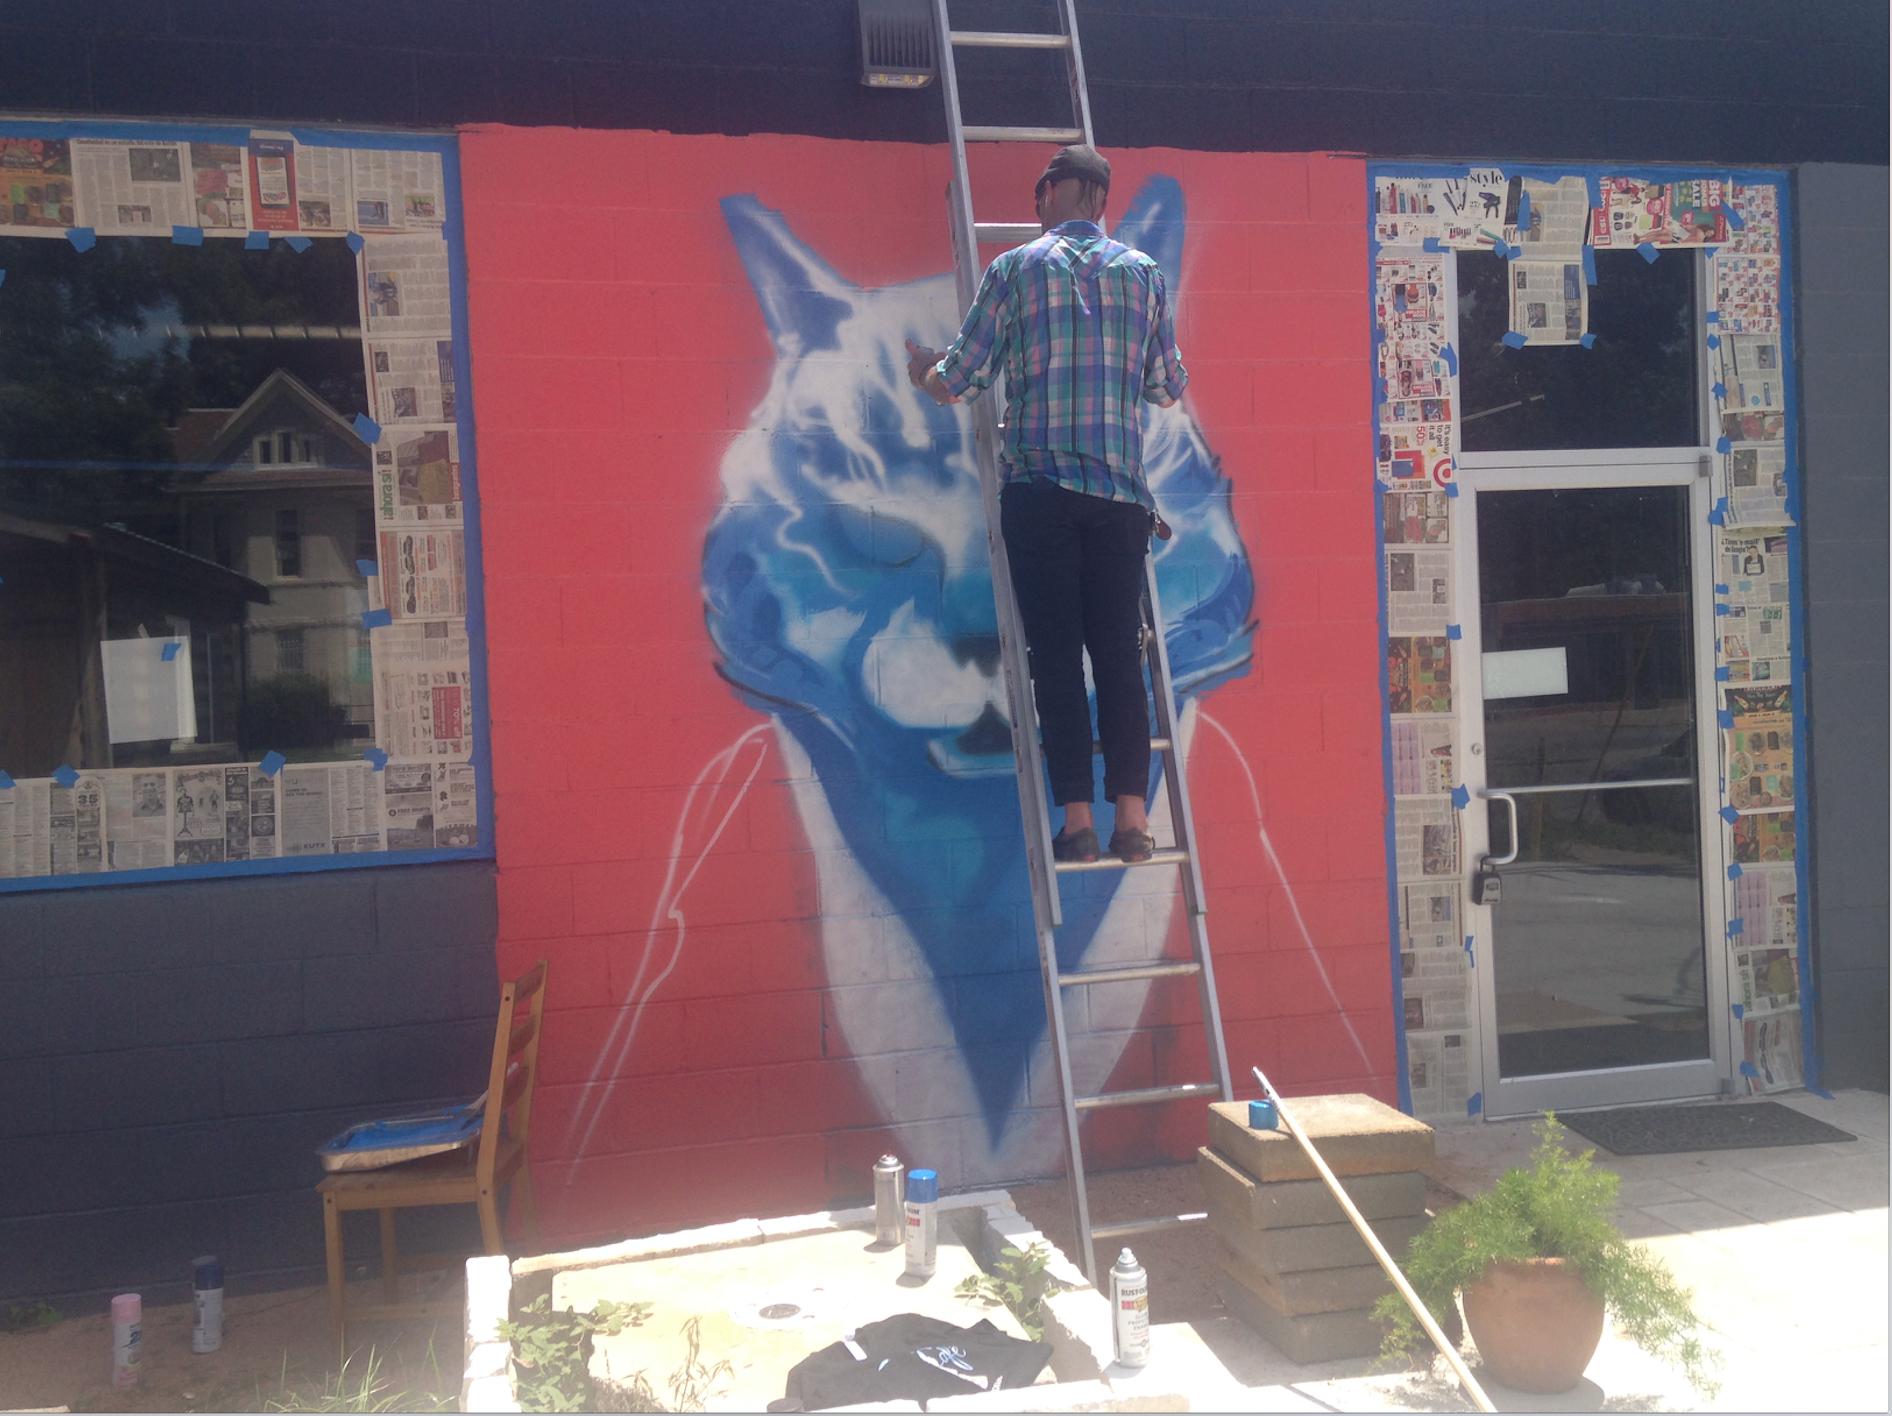 Blue Cat Cafe's mural in progress